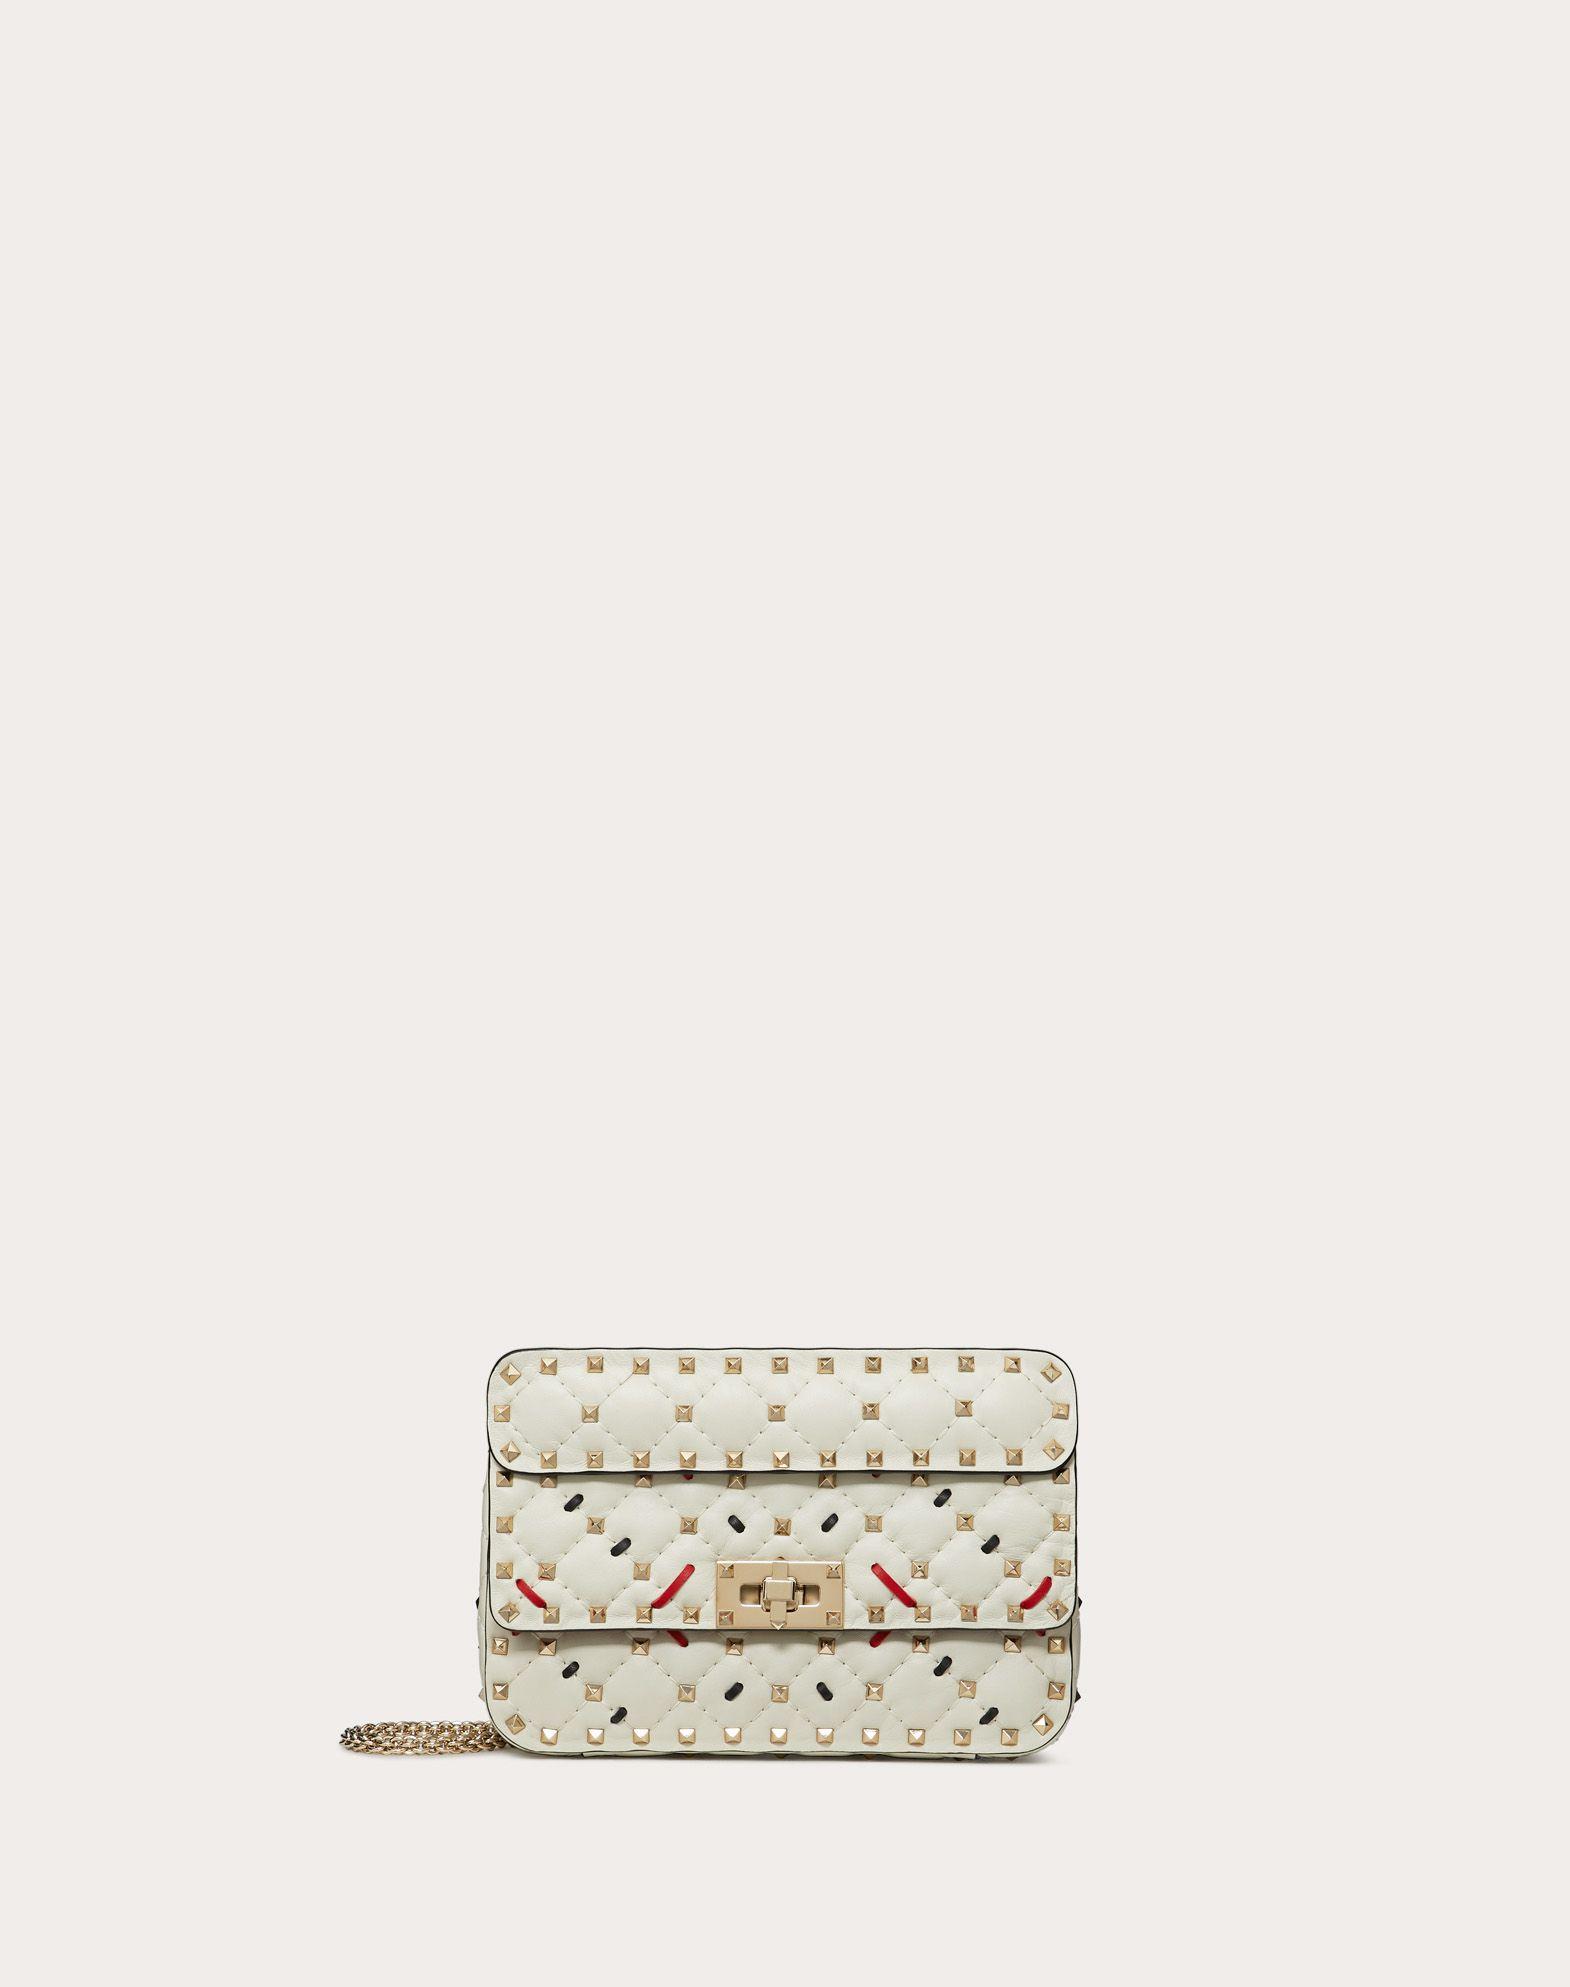 Small Rockstud Spike.It Nappa Bag with Decorative Stitching